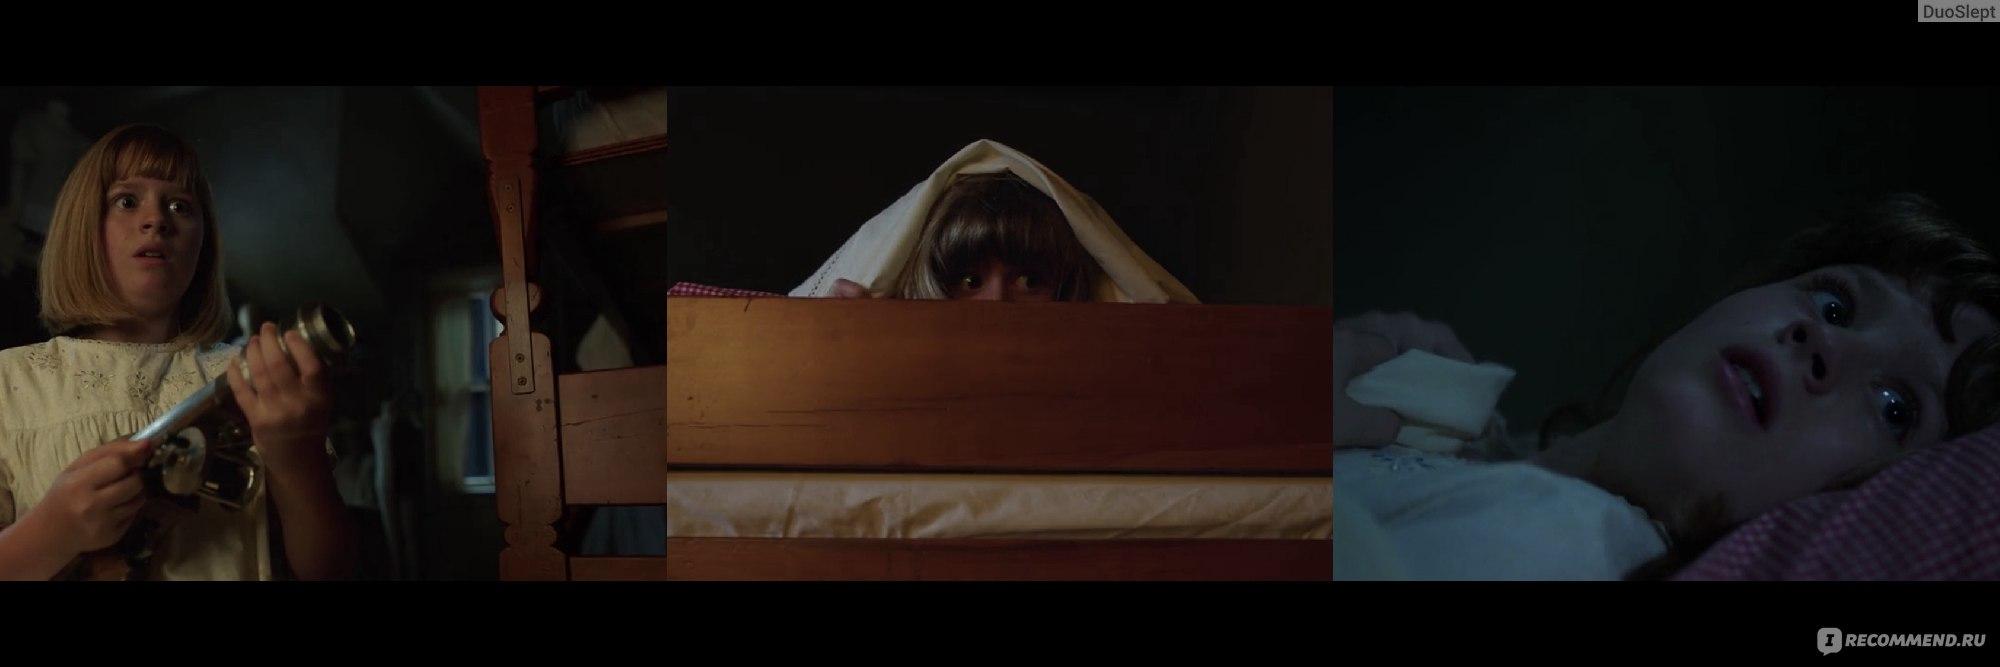 Dexter-Jones nackt Annabelle  RAVAGE